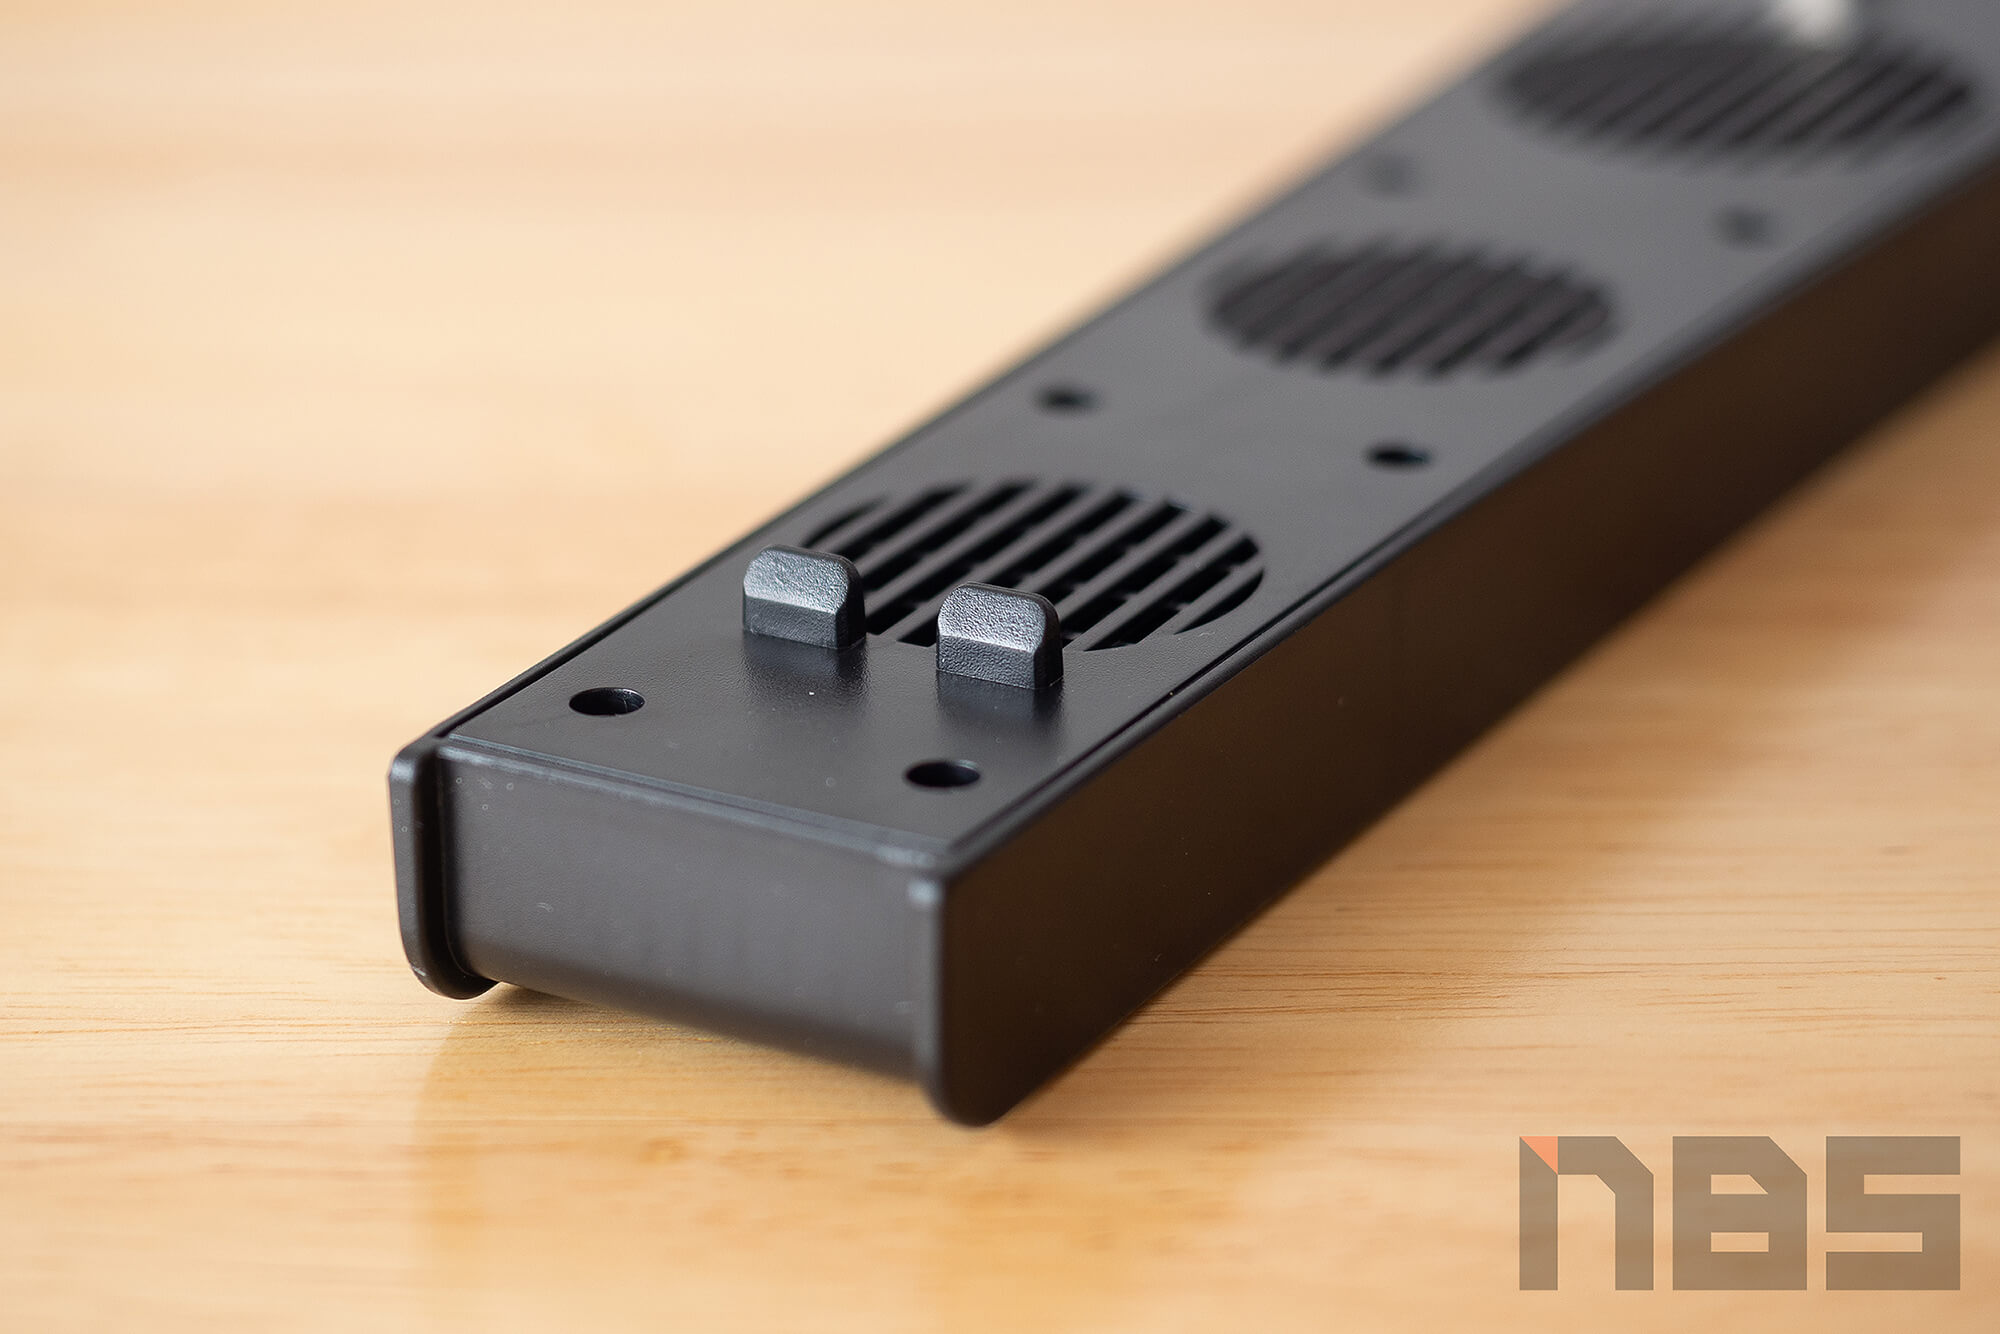 Review PS5 Fan NotebookSPEC 14